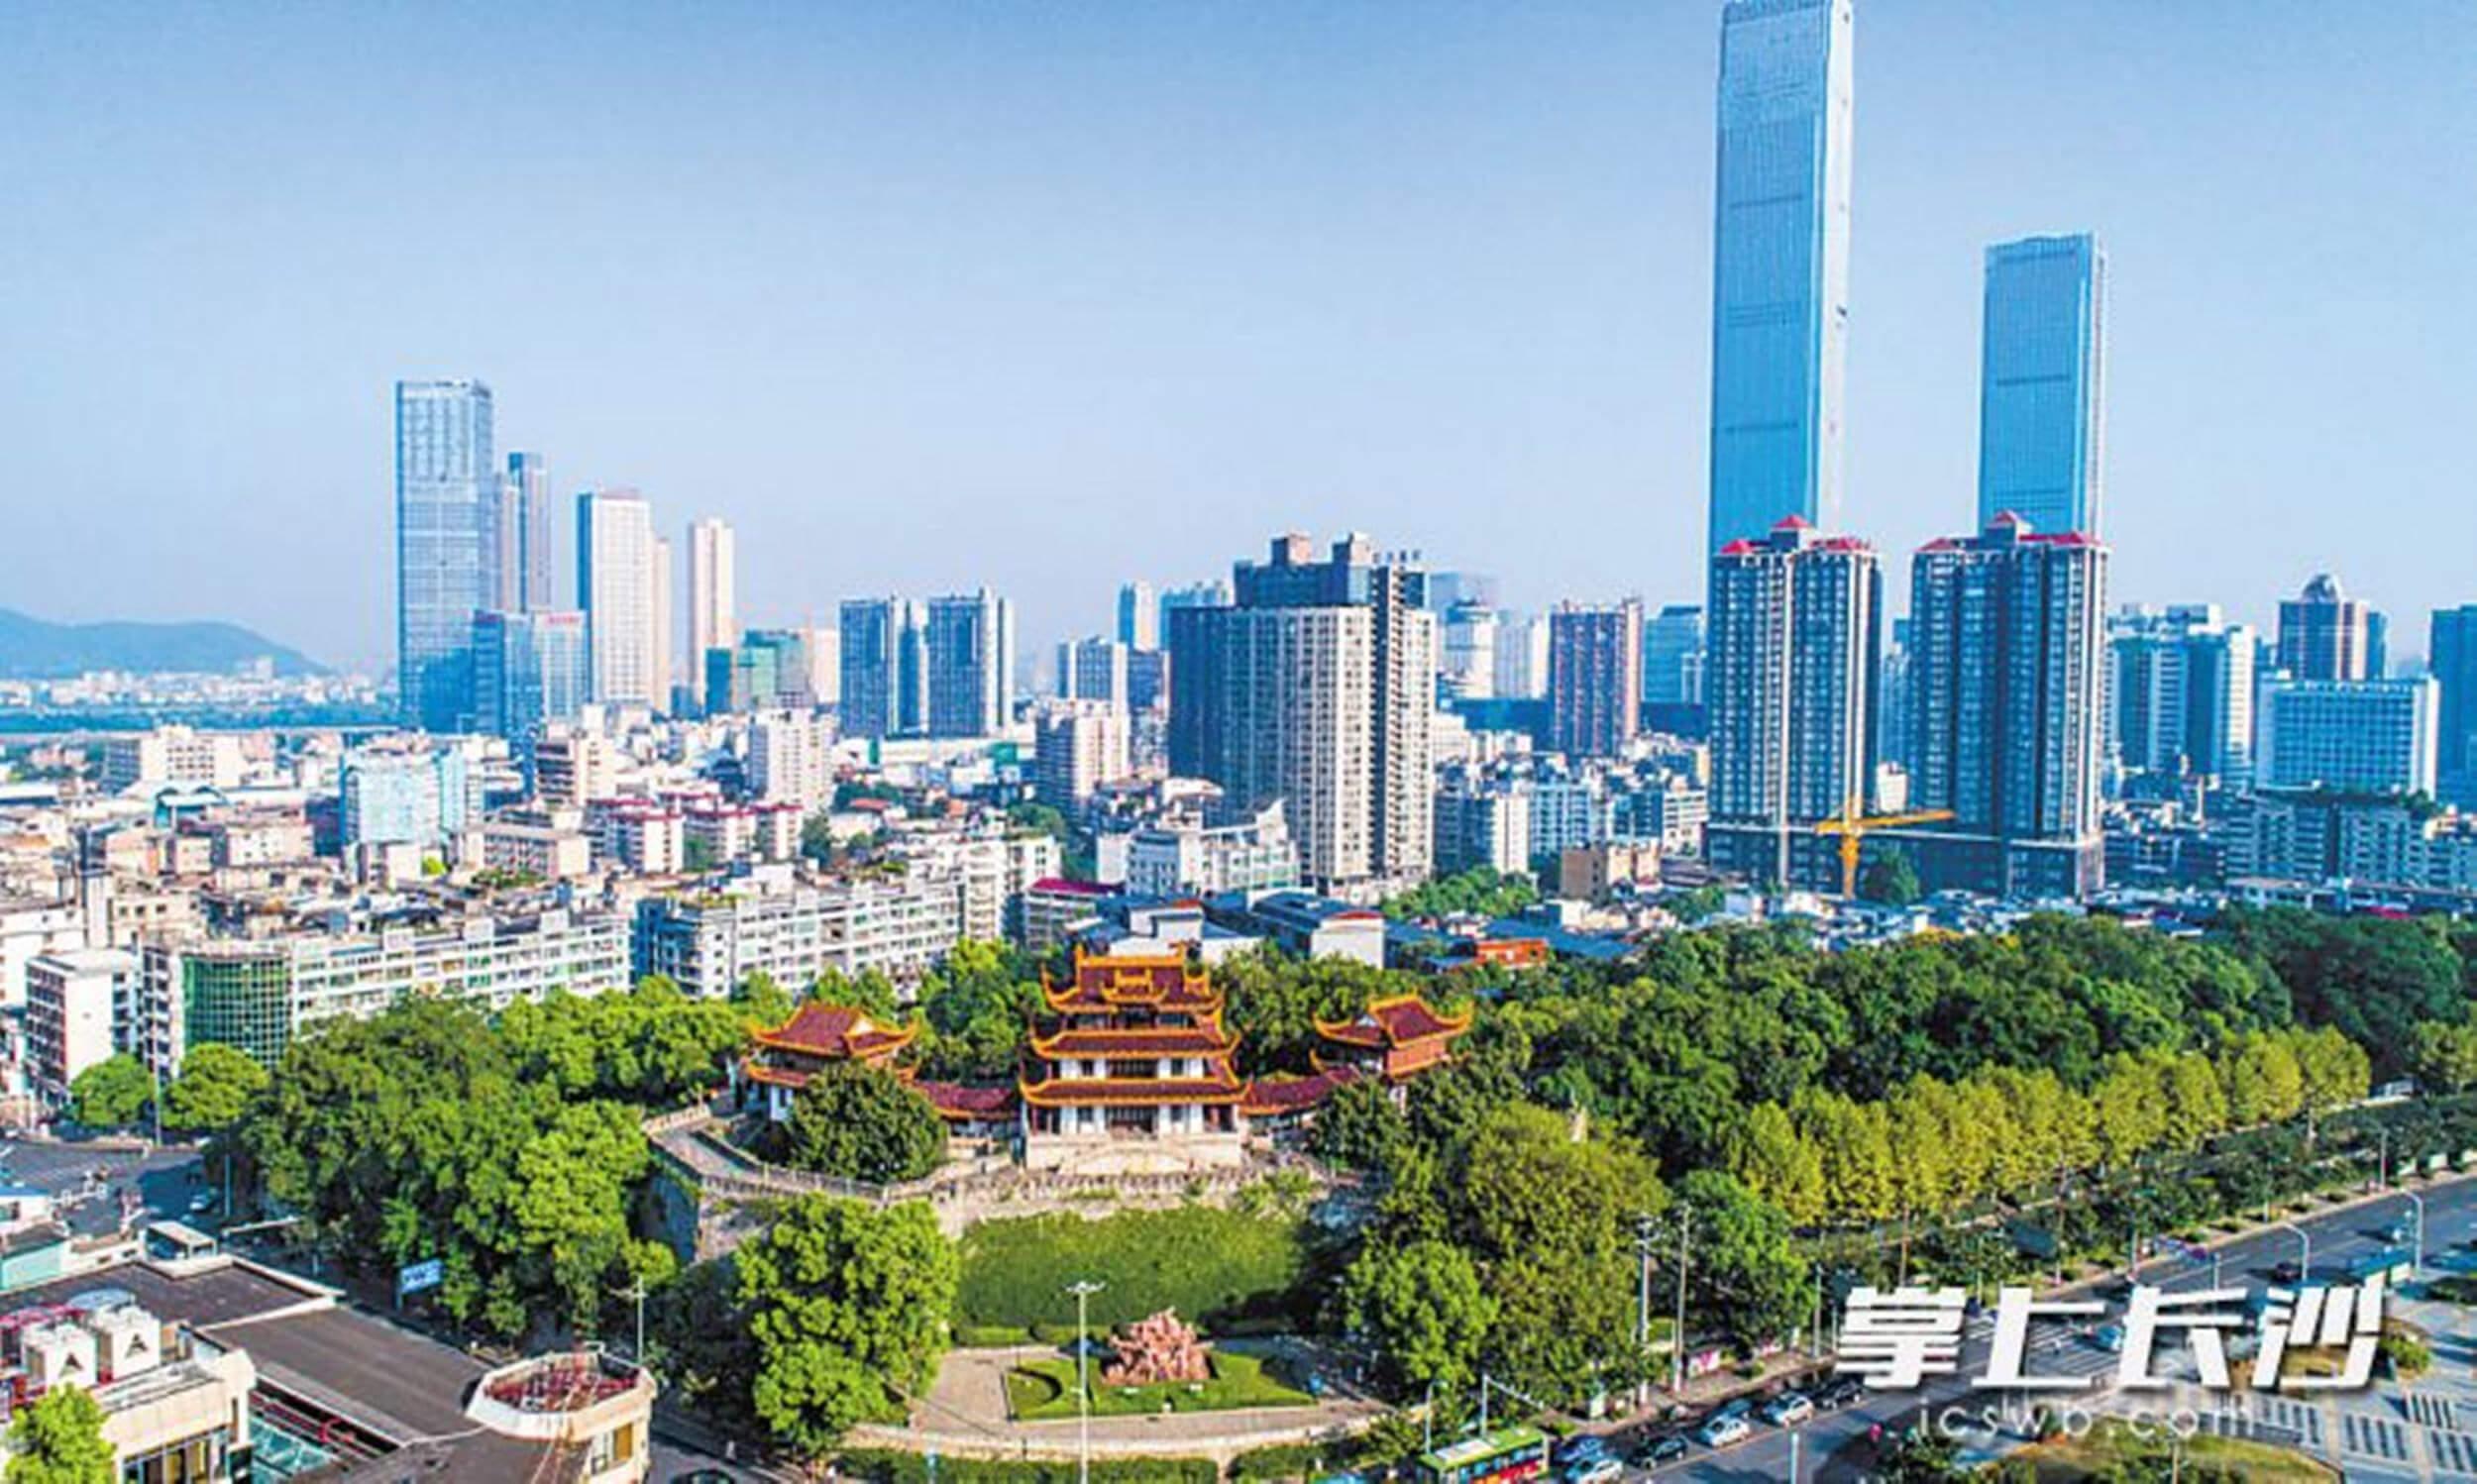 focus-archi-magazine-architecture-insolite-Changsha-1.jpg